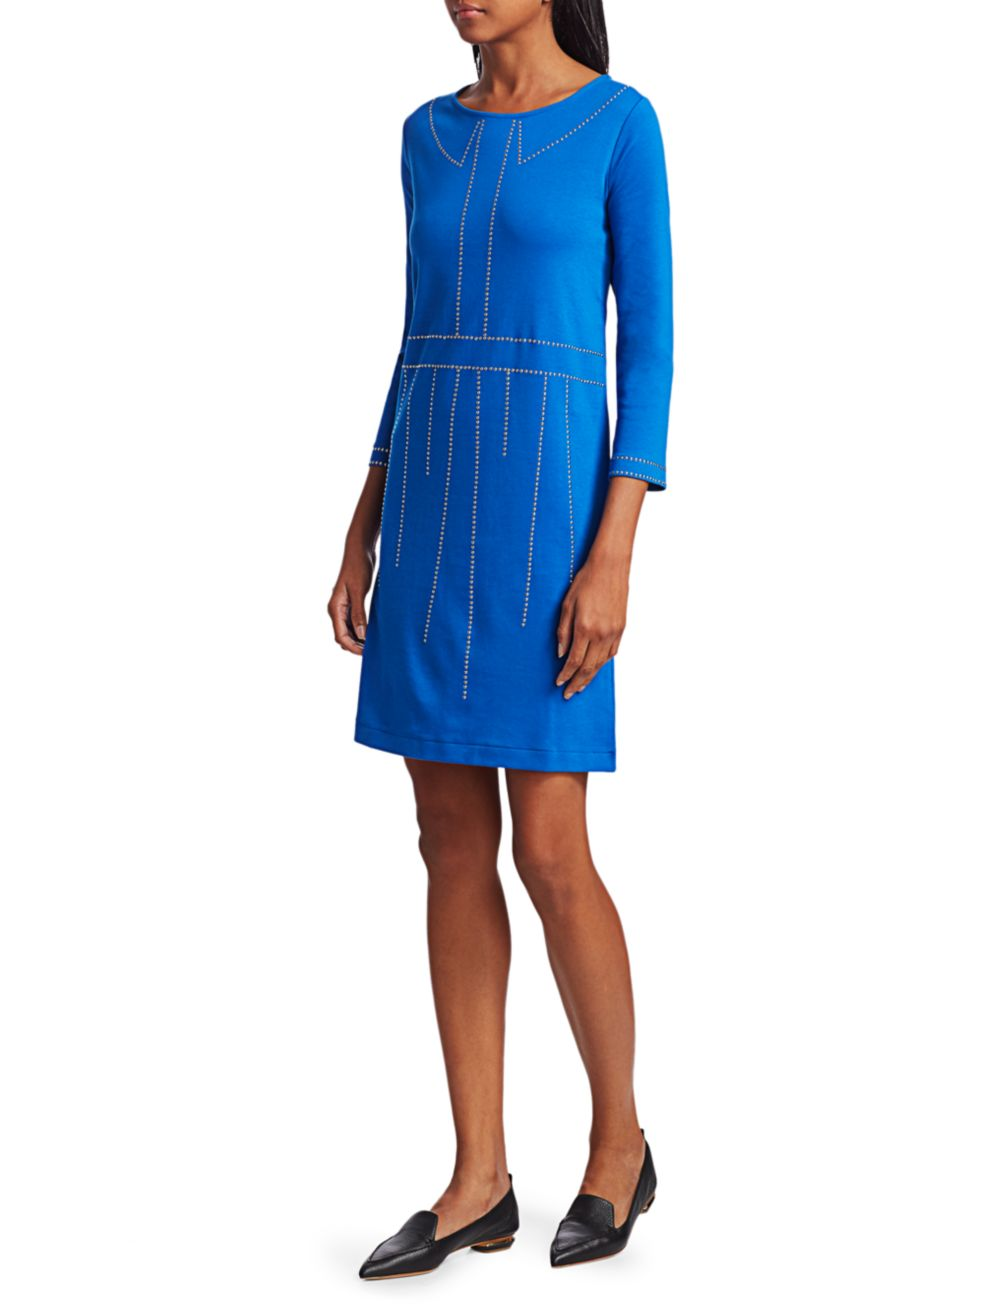 Joan Vass Trompe L'Oeil Studded Three-Quarter Sleeve Dress | SaksFifthAvenue